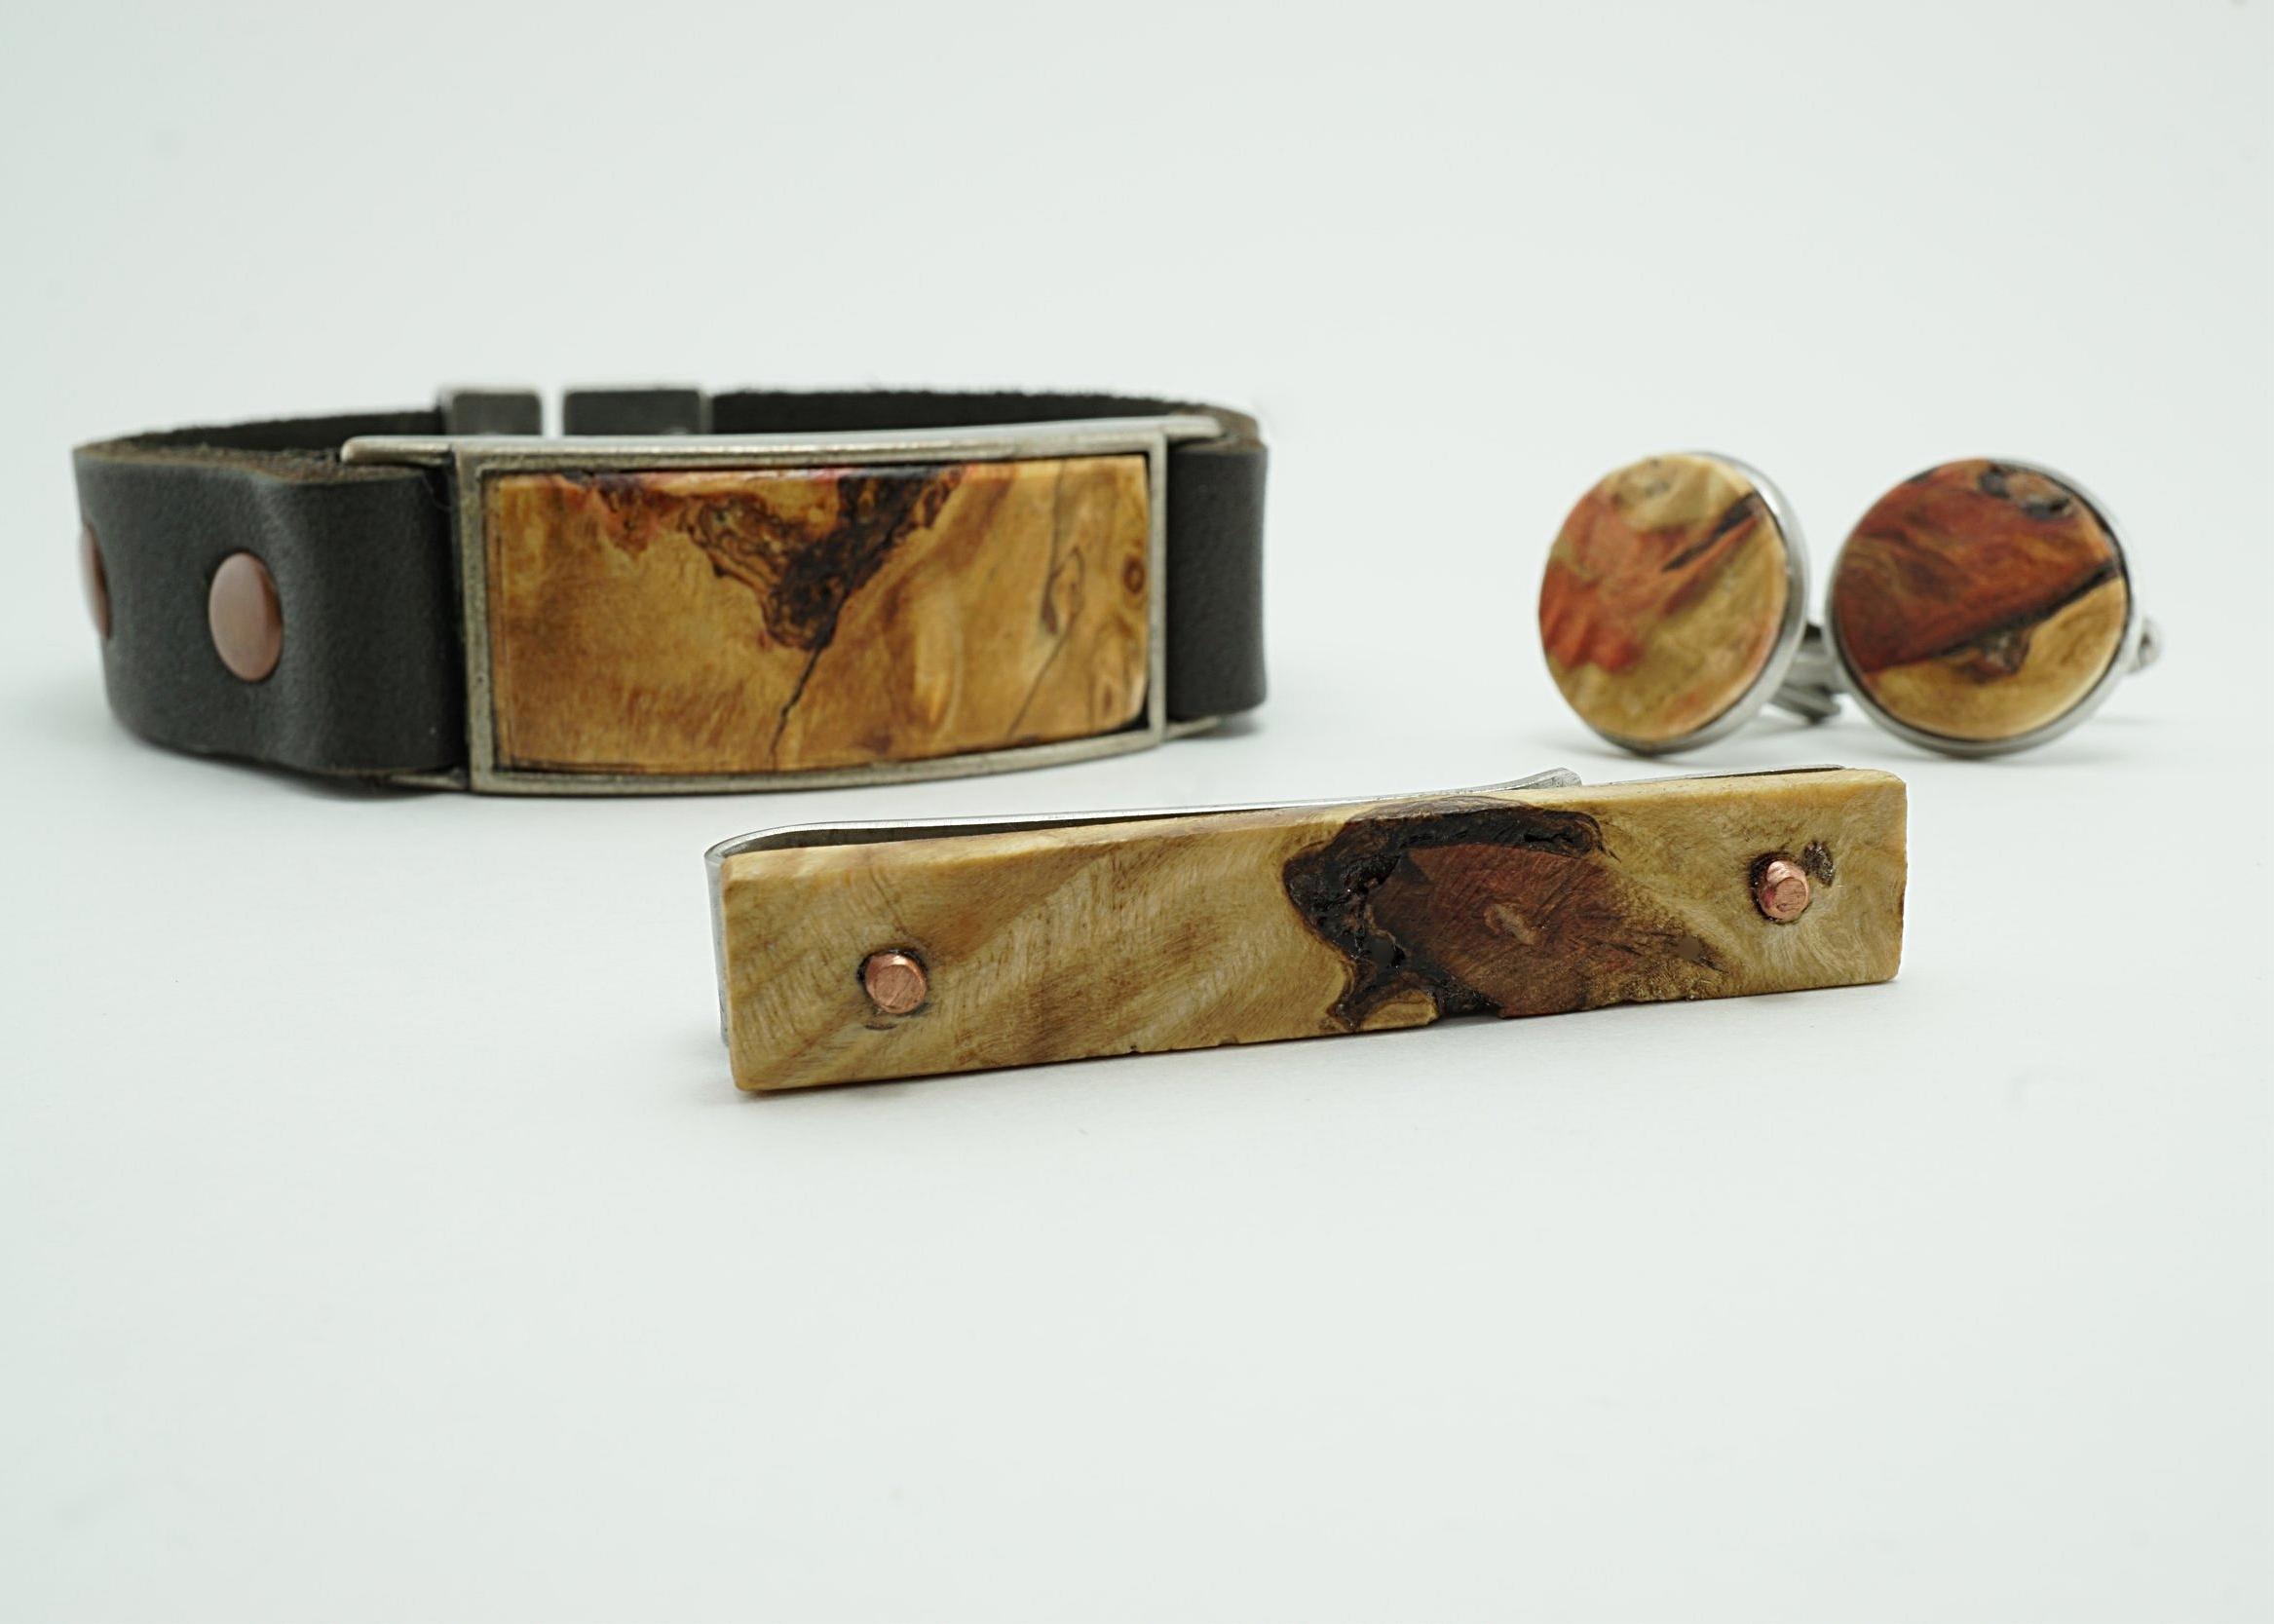 Box Elder burl bracelet, tie clip, and cuff links